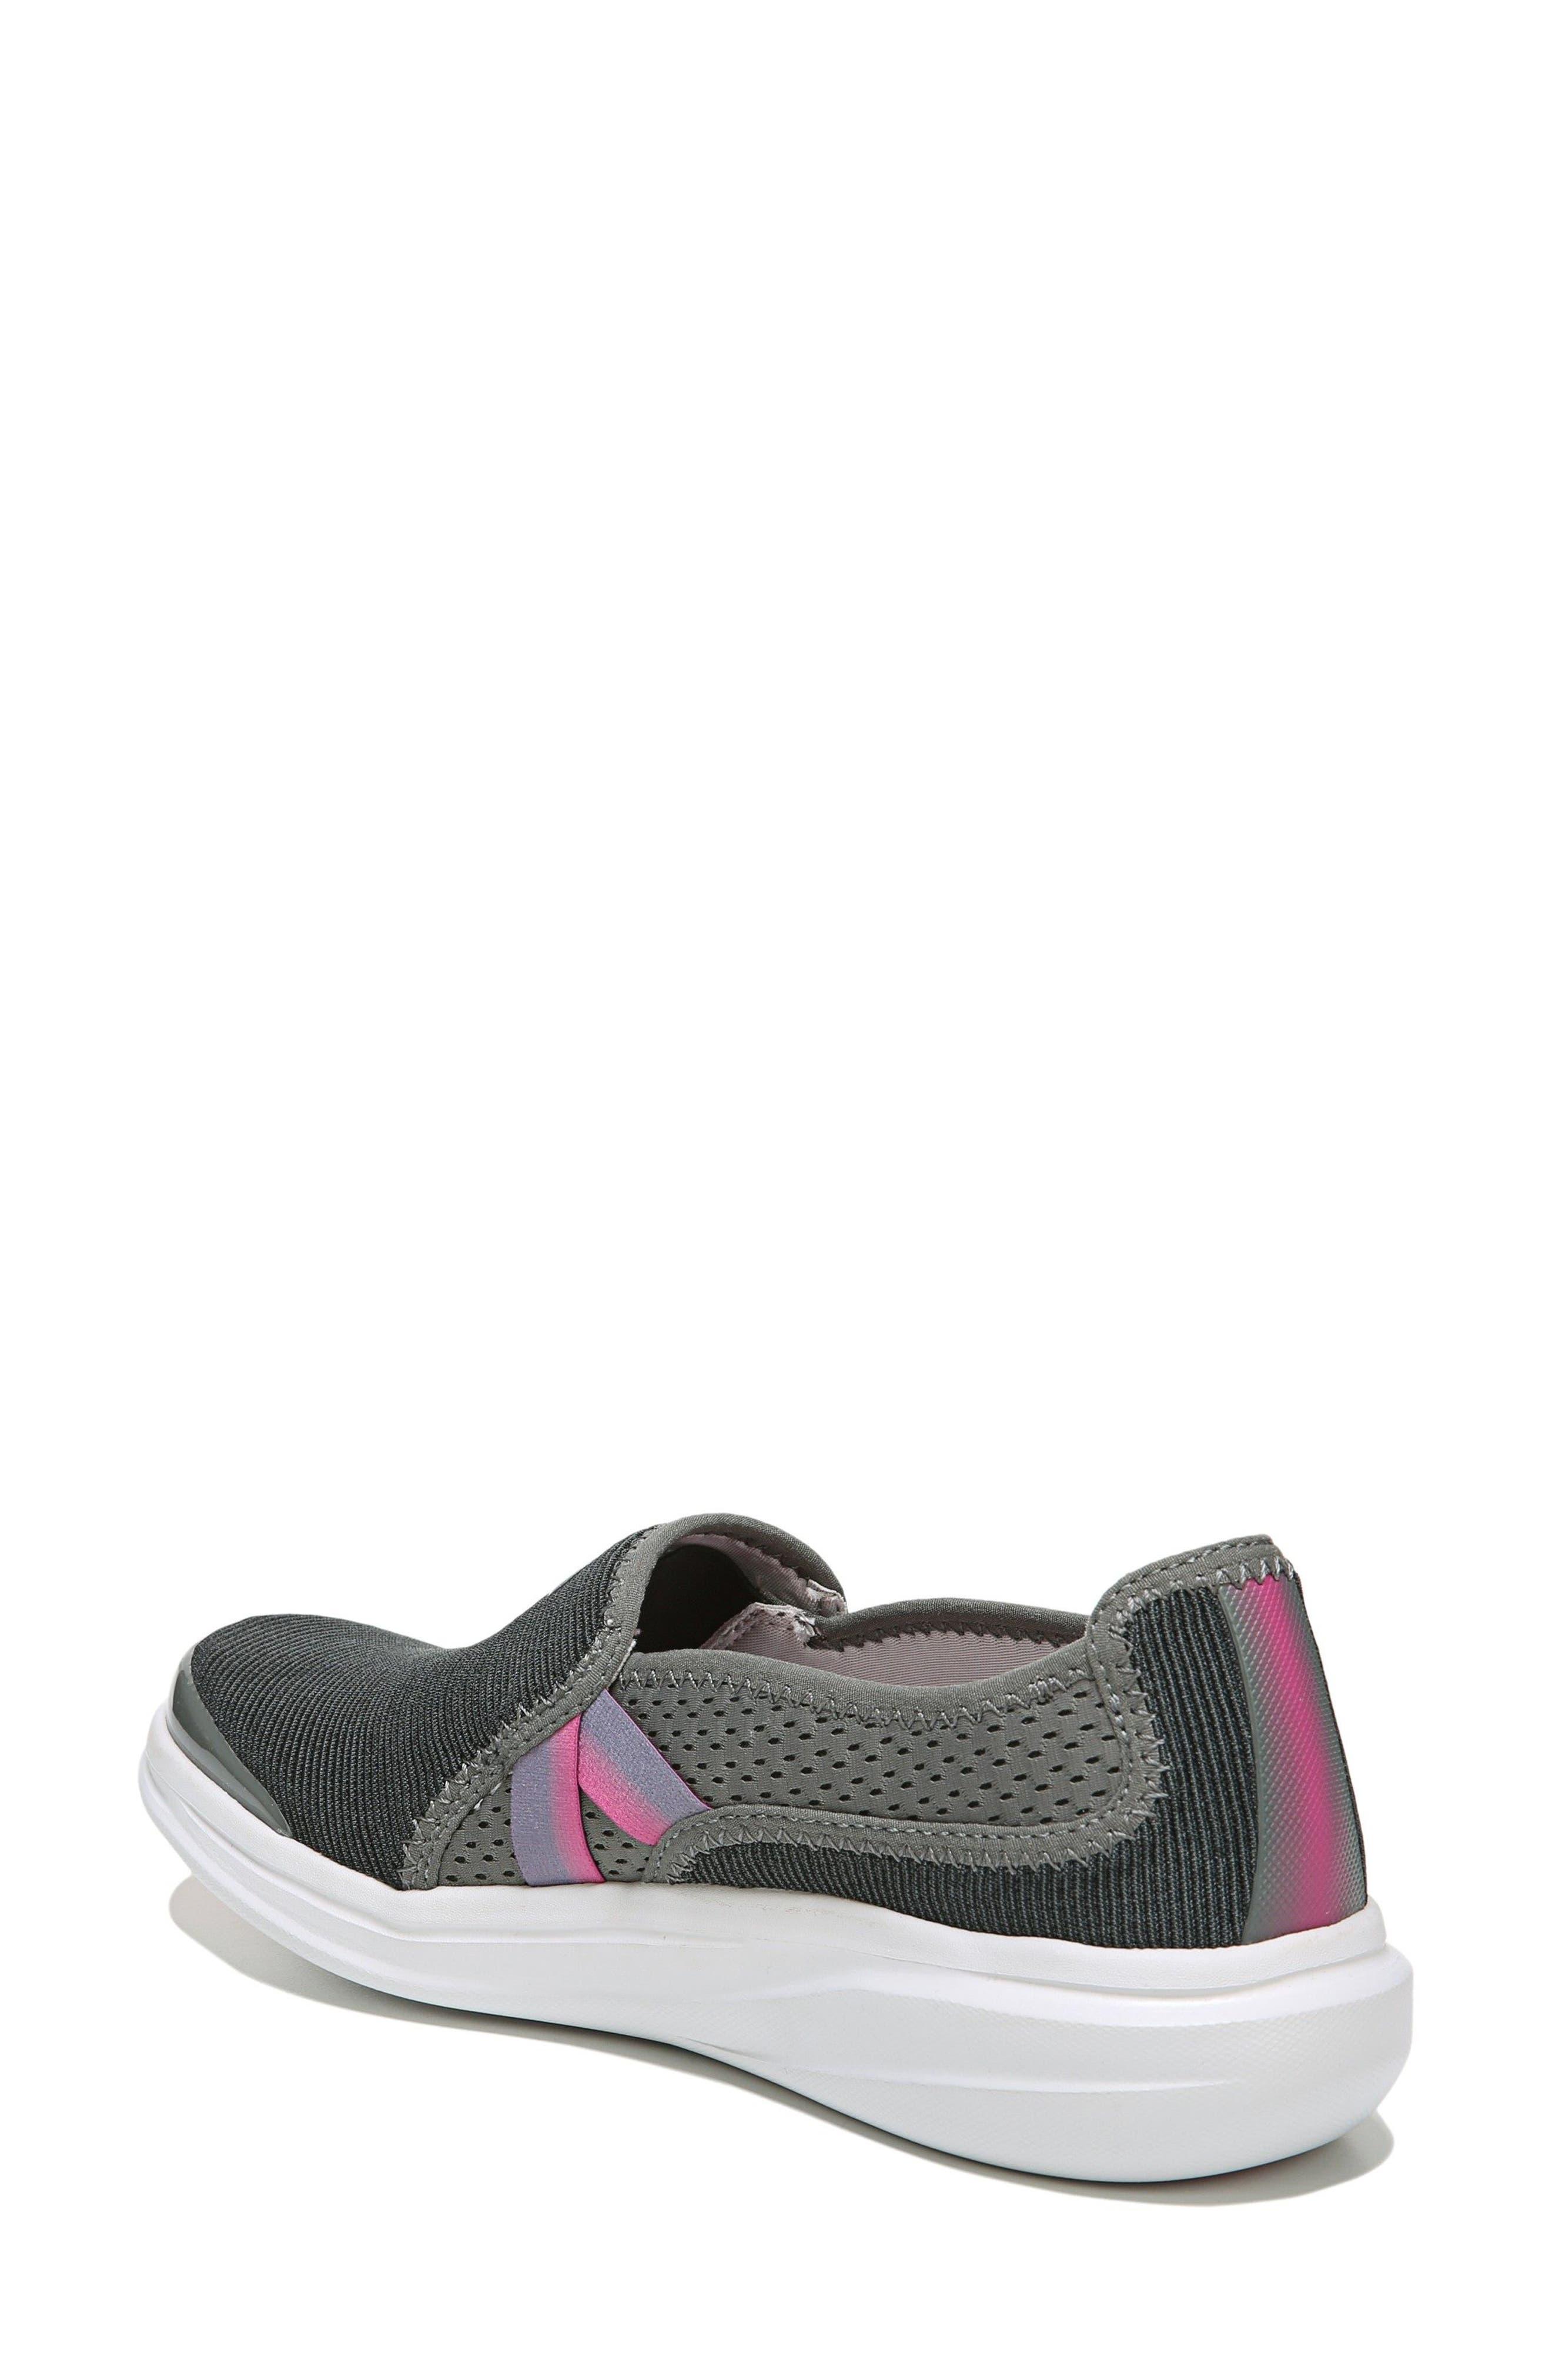 Cruise Slip-On Sneaker,                             Alternate thumbnail 2, color,                             DARK GREY FABRIC